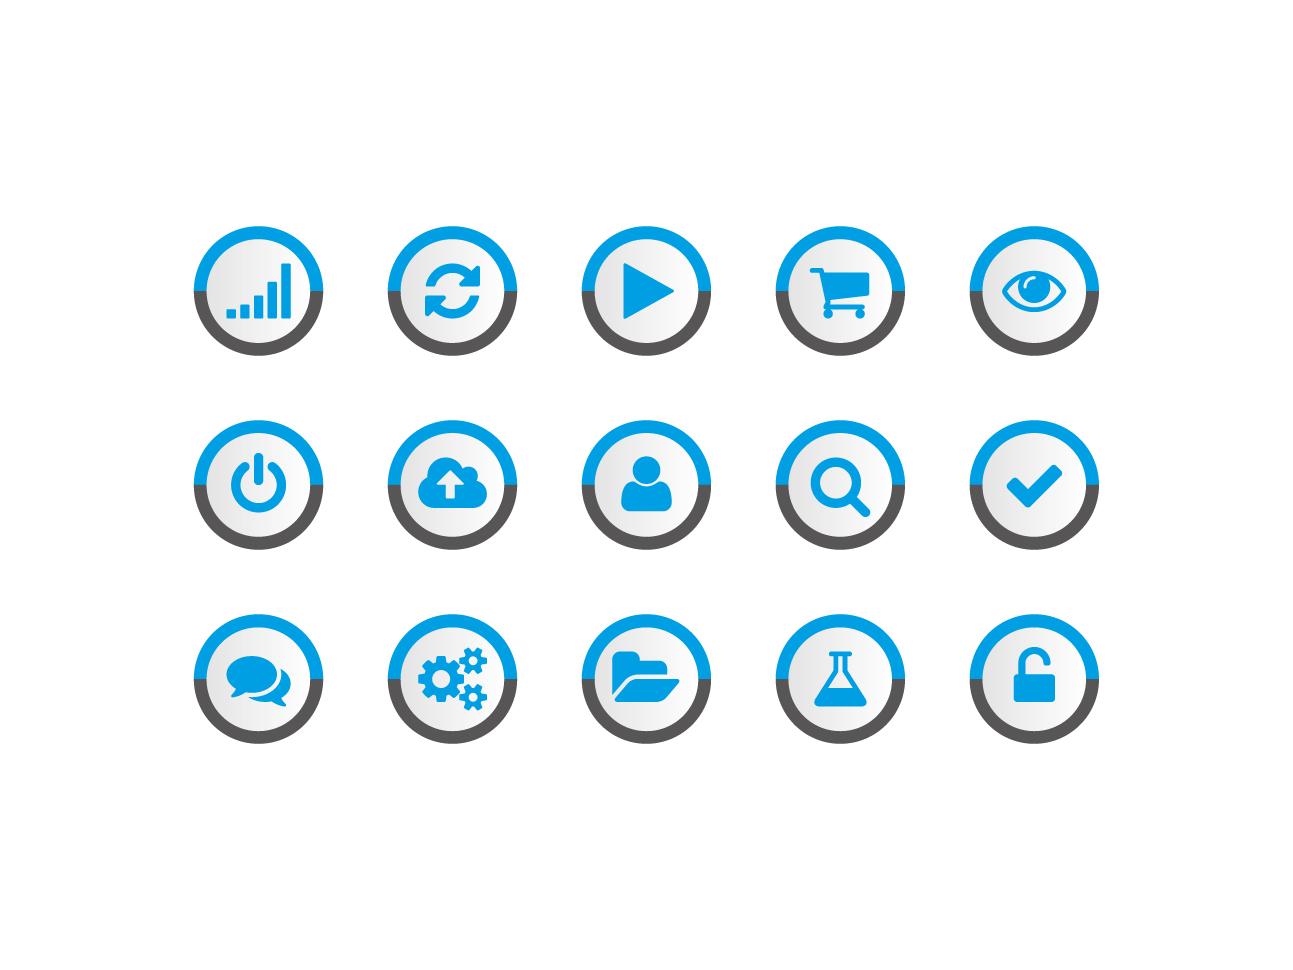 martin_zech_design_corporate_design_SciBrix-lab-automation_icon-system